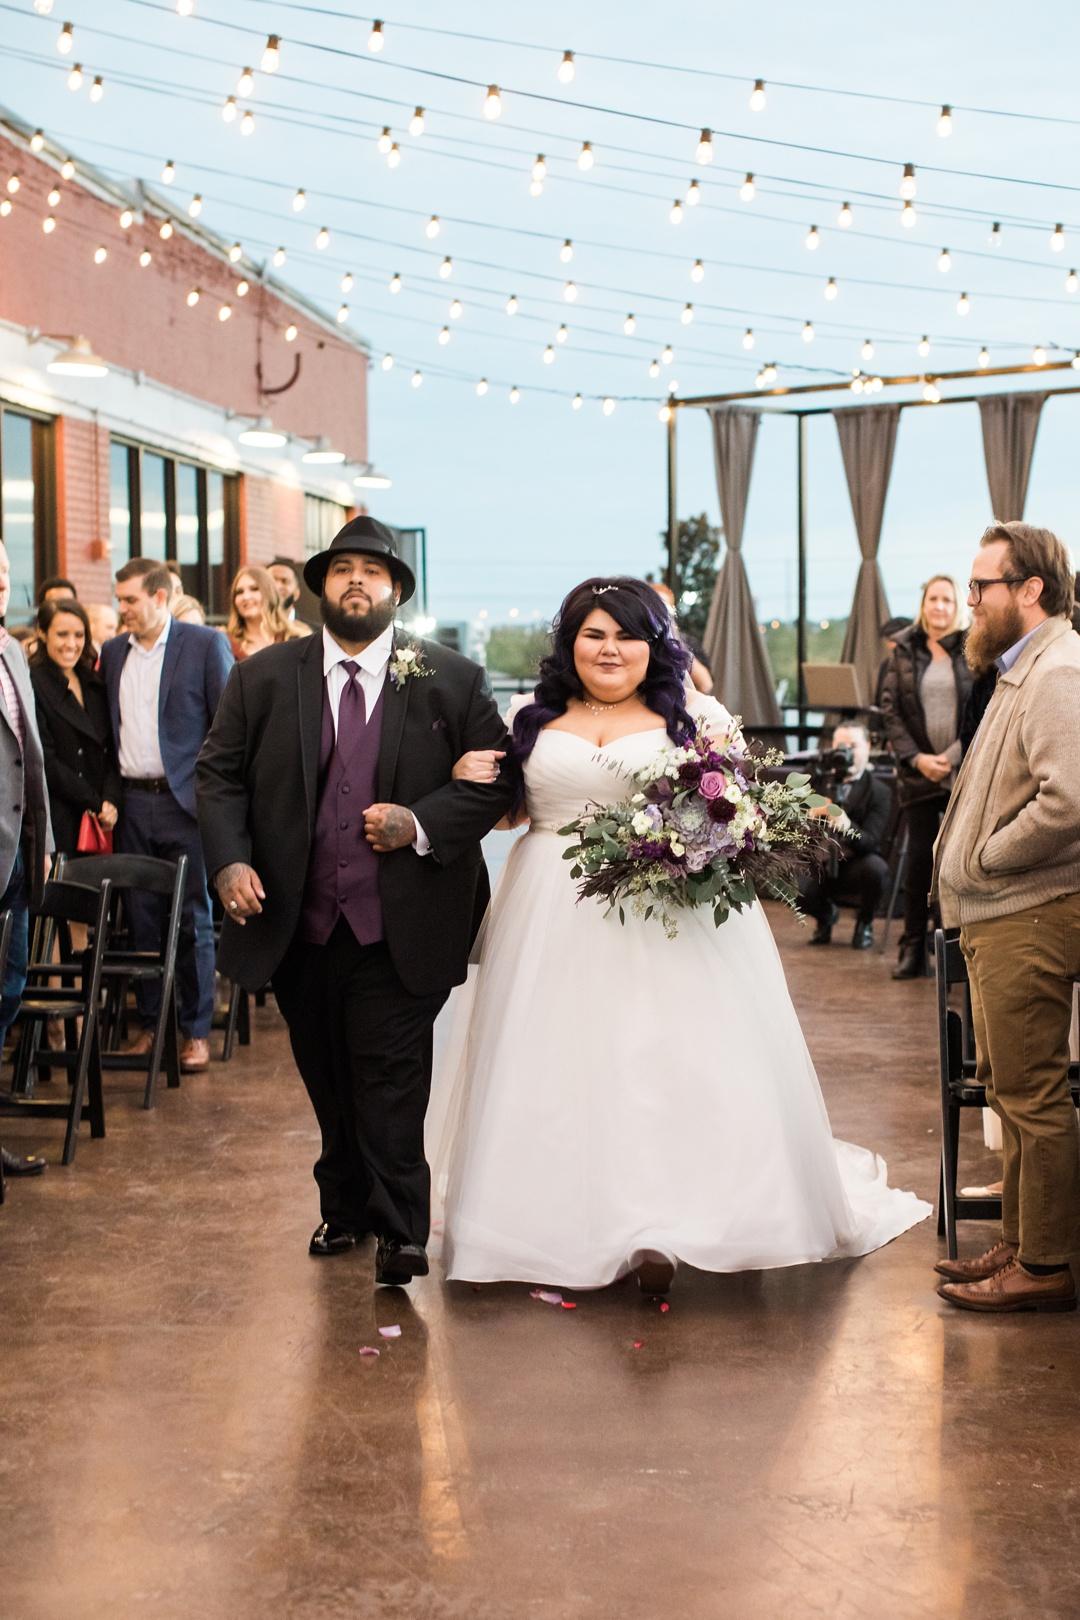 gilleys_dallas_wedding-53